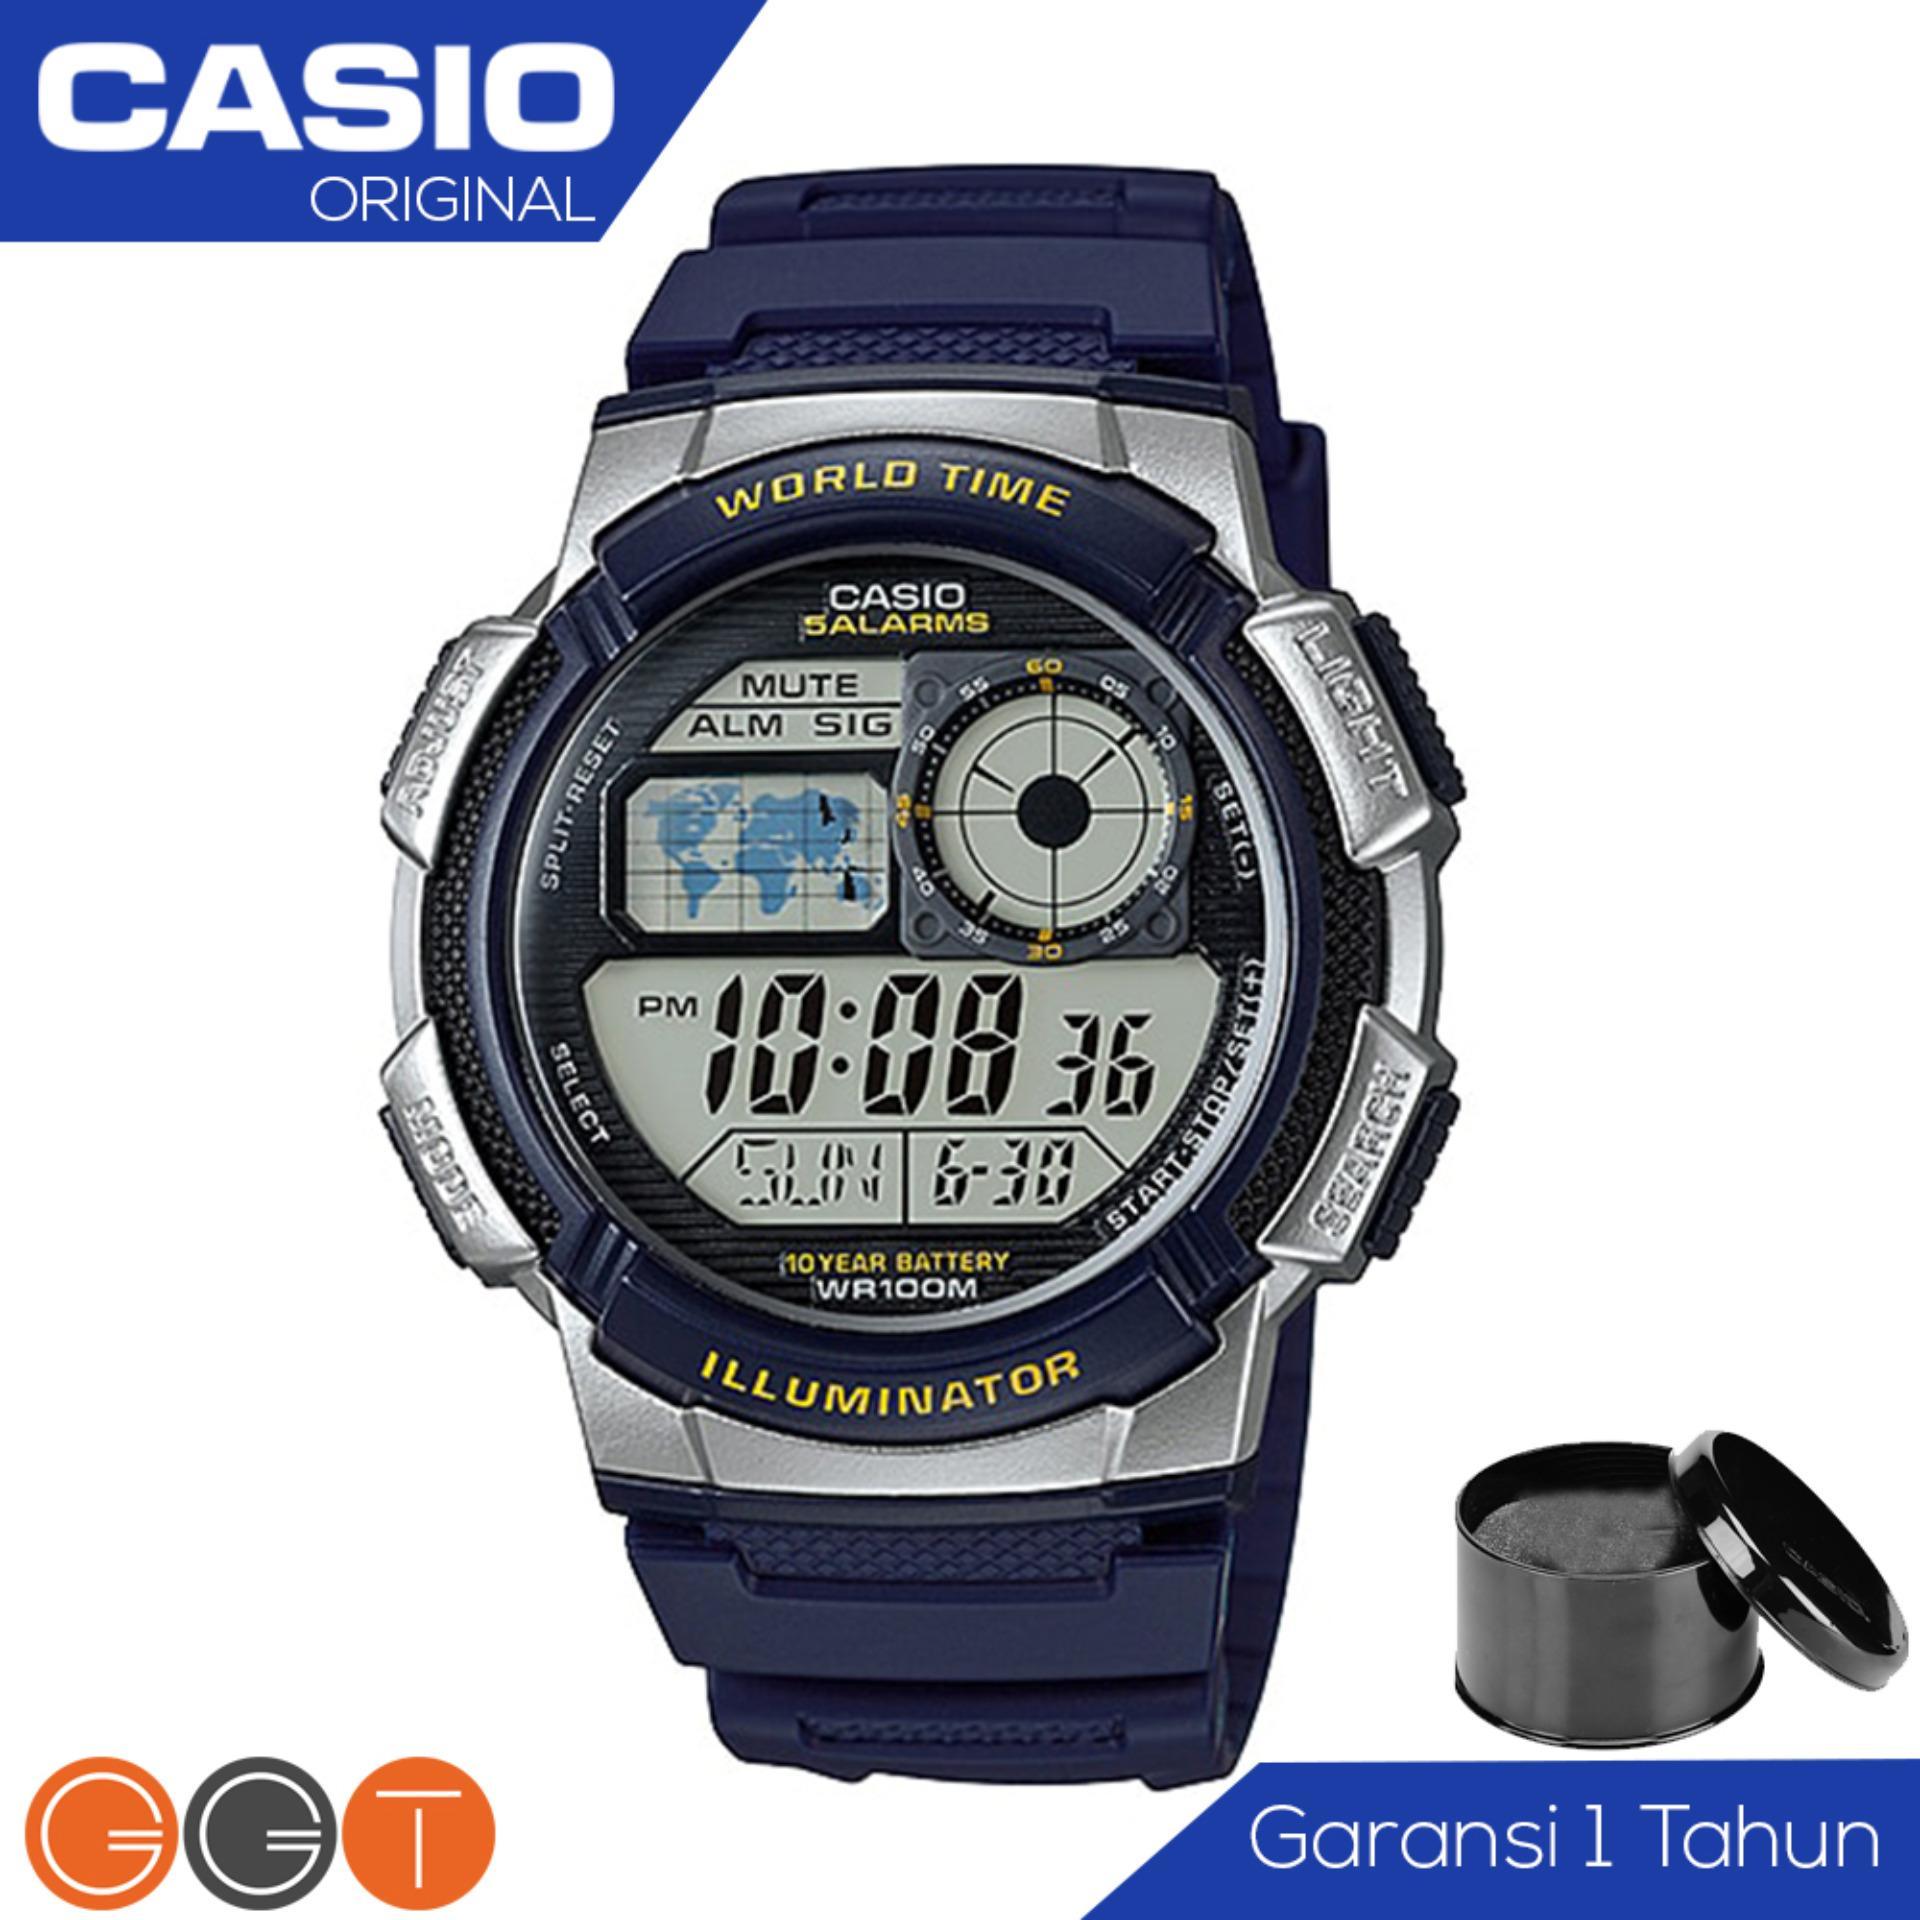 Harga Casio Illuminator Ae 1000W 2Avdf Jam Tangan Pria Tali Karet Digital Movement Biru Dan Spesifikasinya